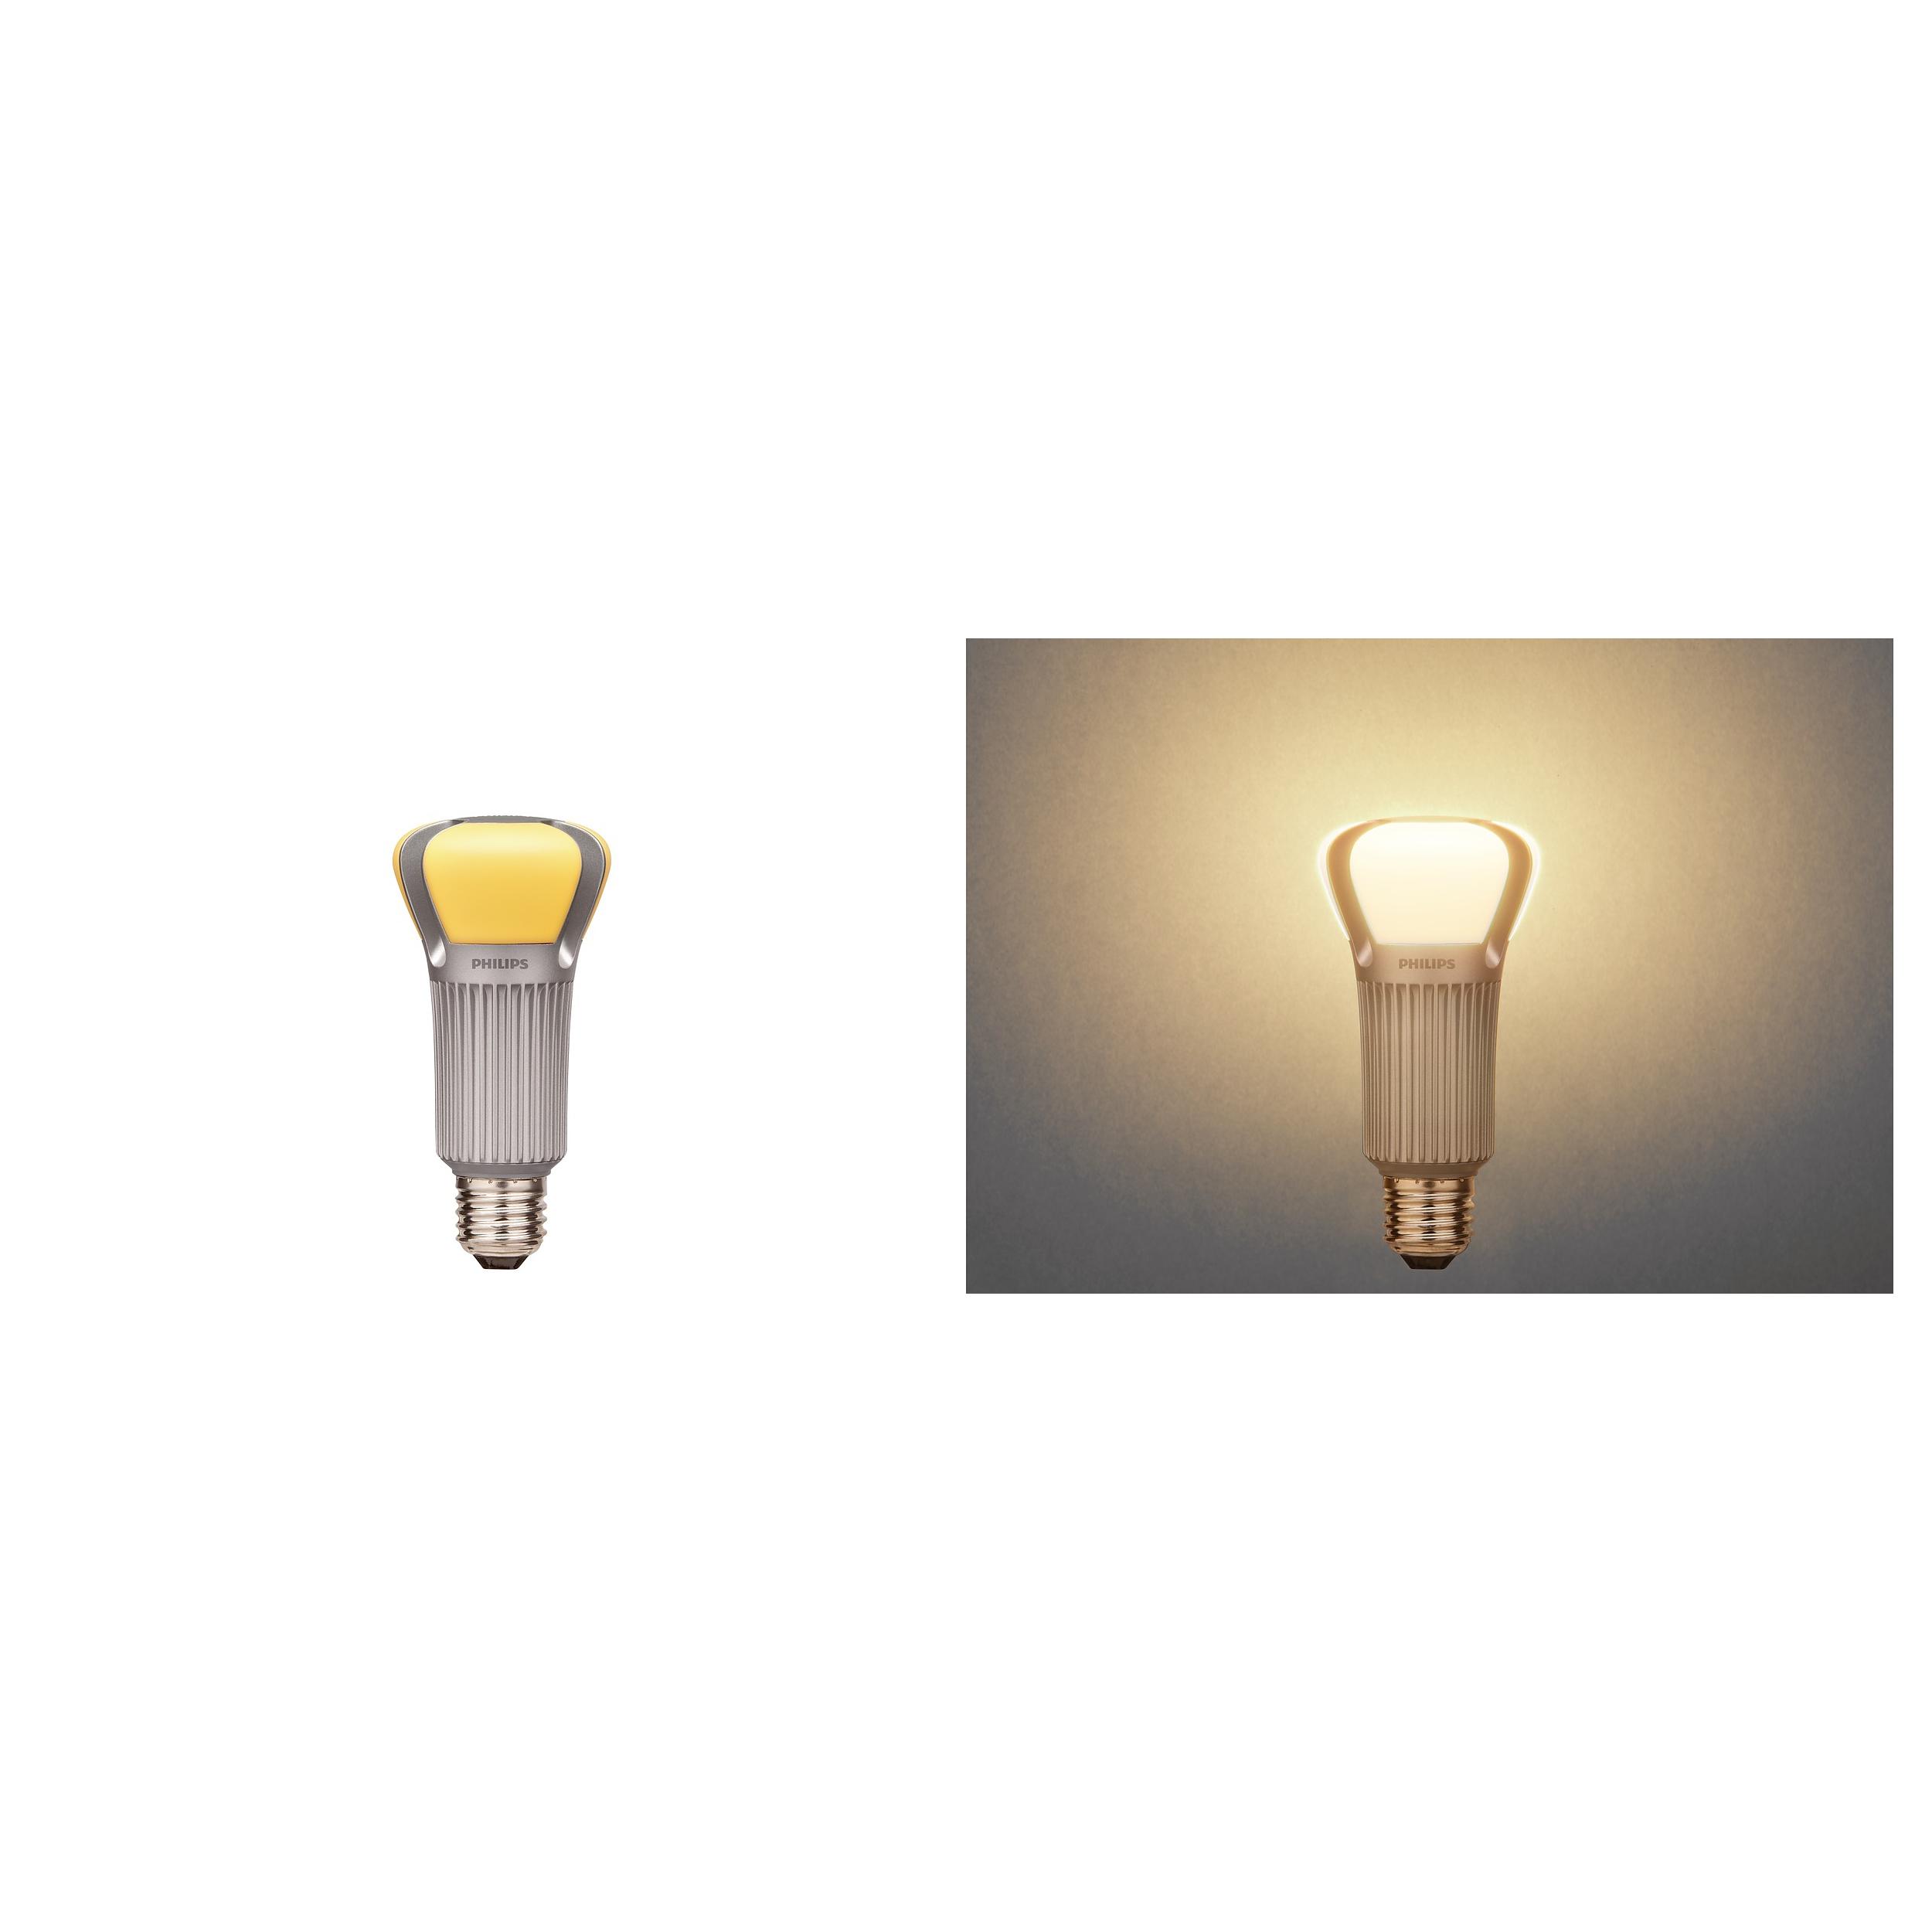 philips led lampe standardform e27 75w warmwei es licht. Black Bedroom Furniture Sets. Home Design Ideas